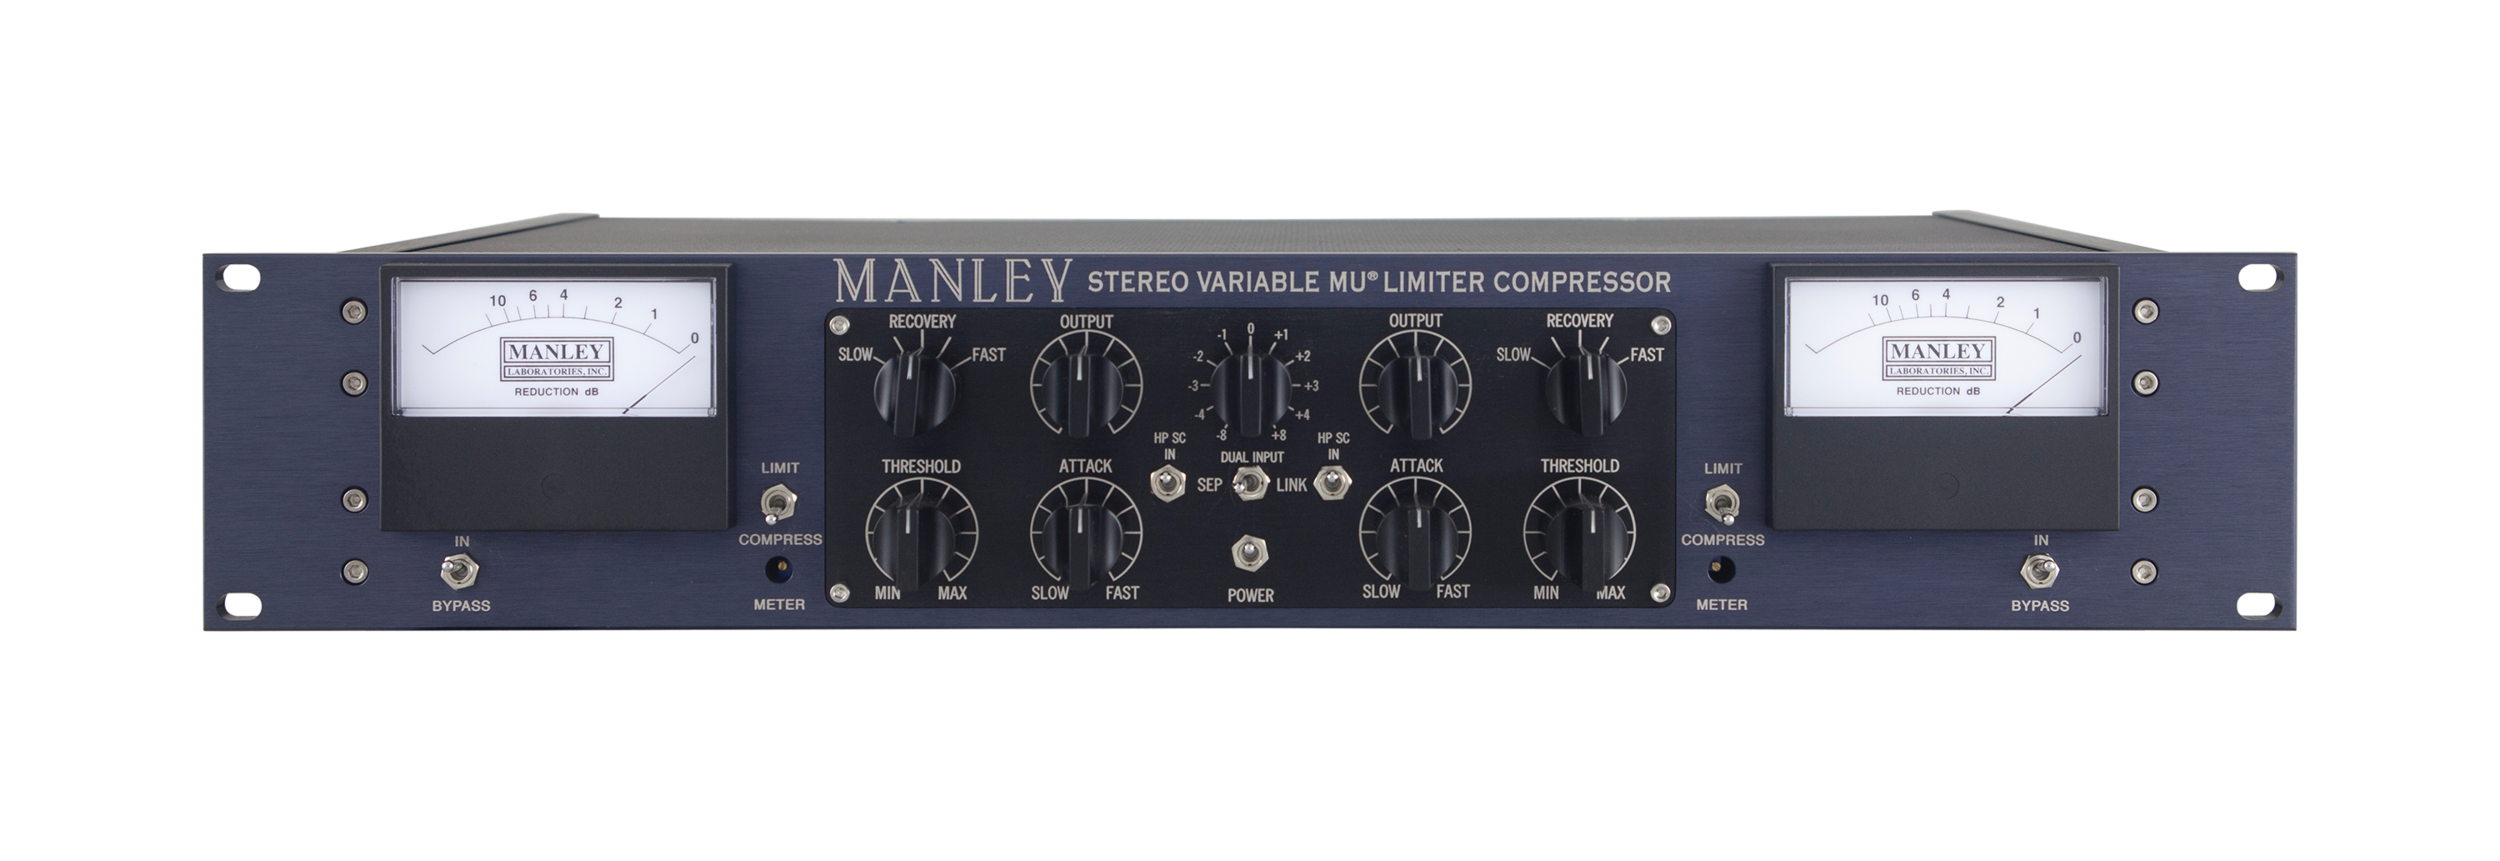 Manley Stereo Variable Mu image1